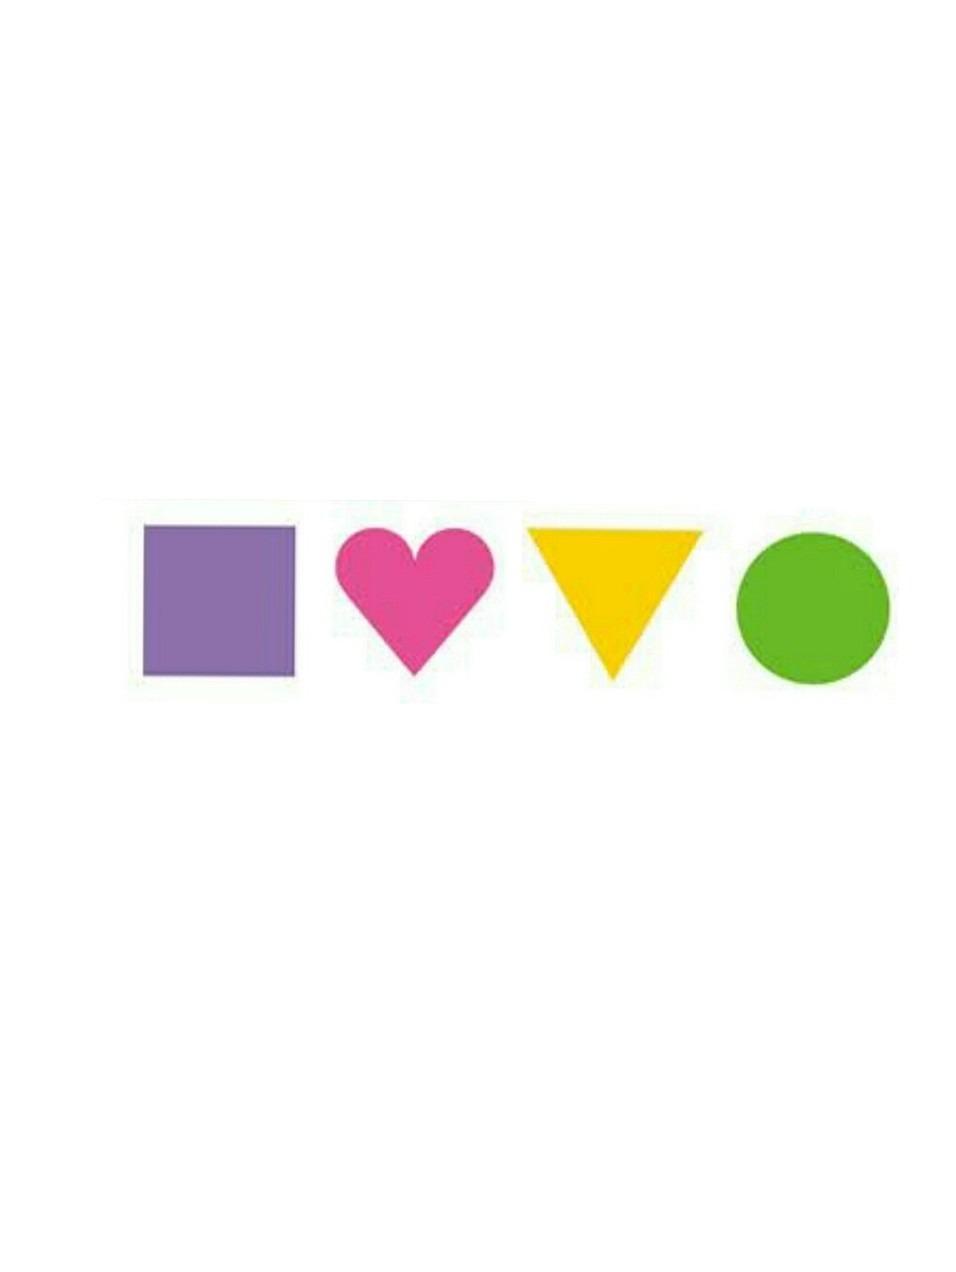 News ロゴ 54607115 完全無料画像検索のプリ画像 Bygmo